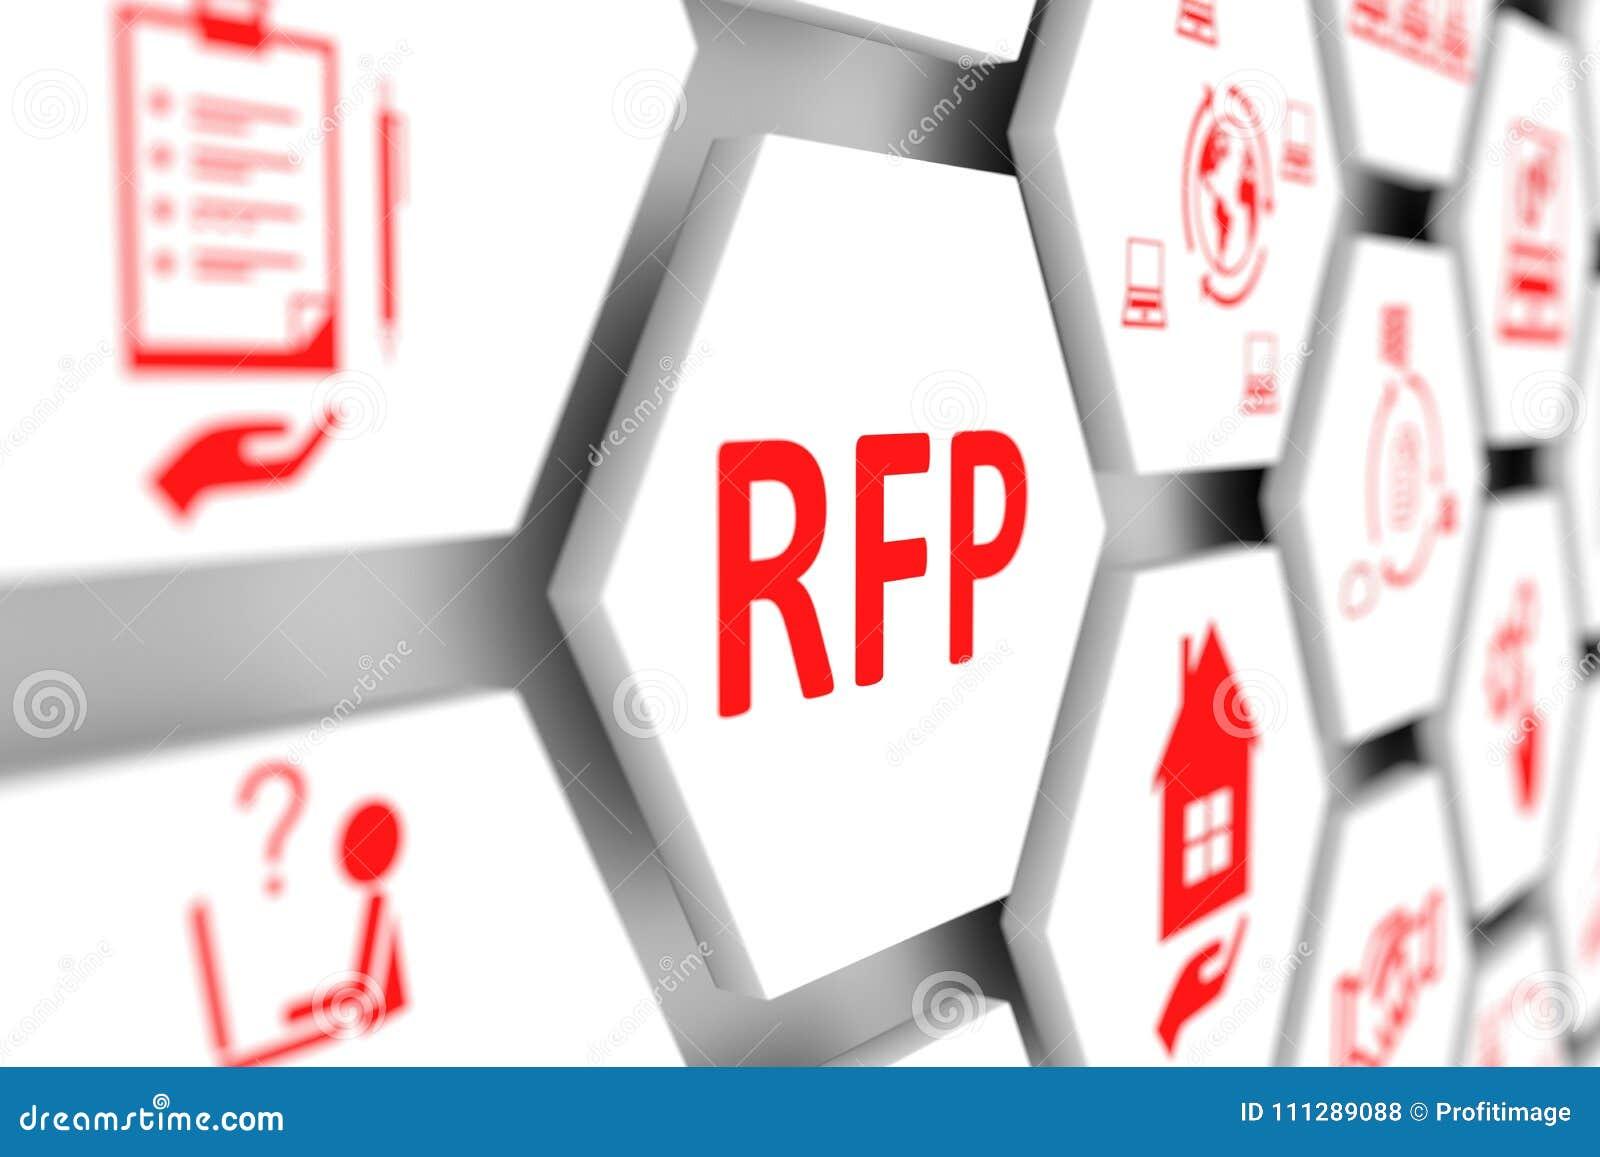 RFP concept